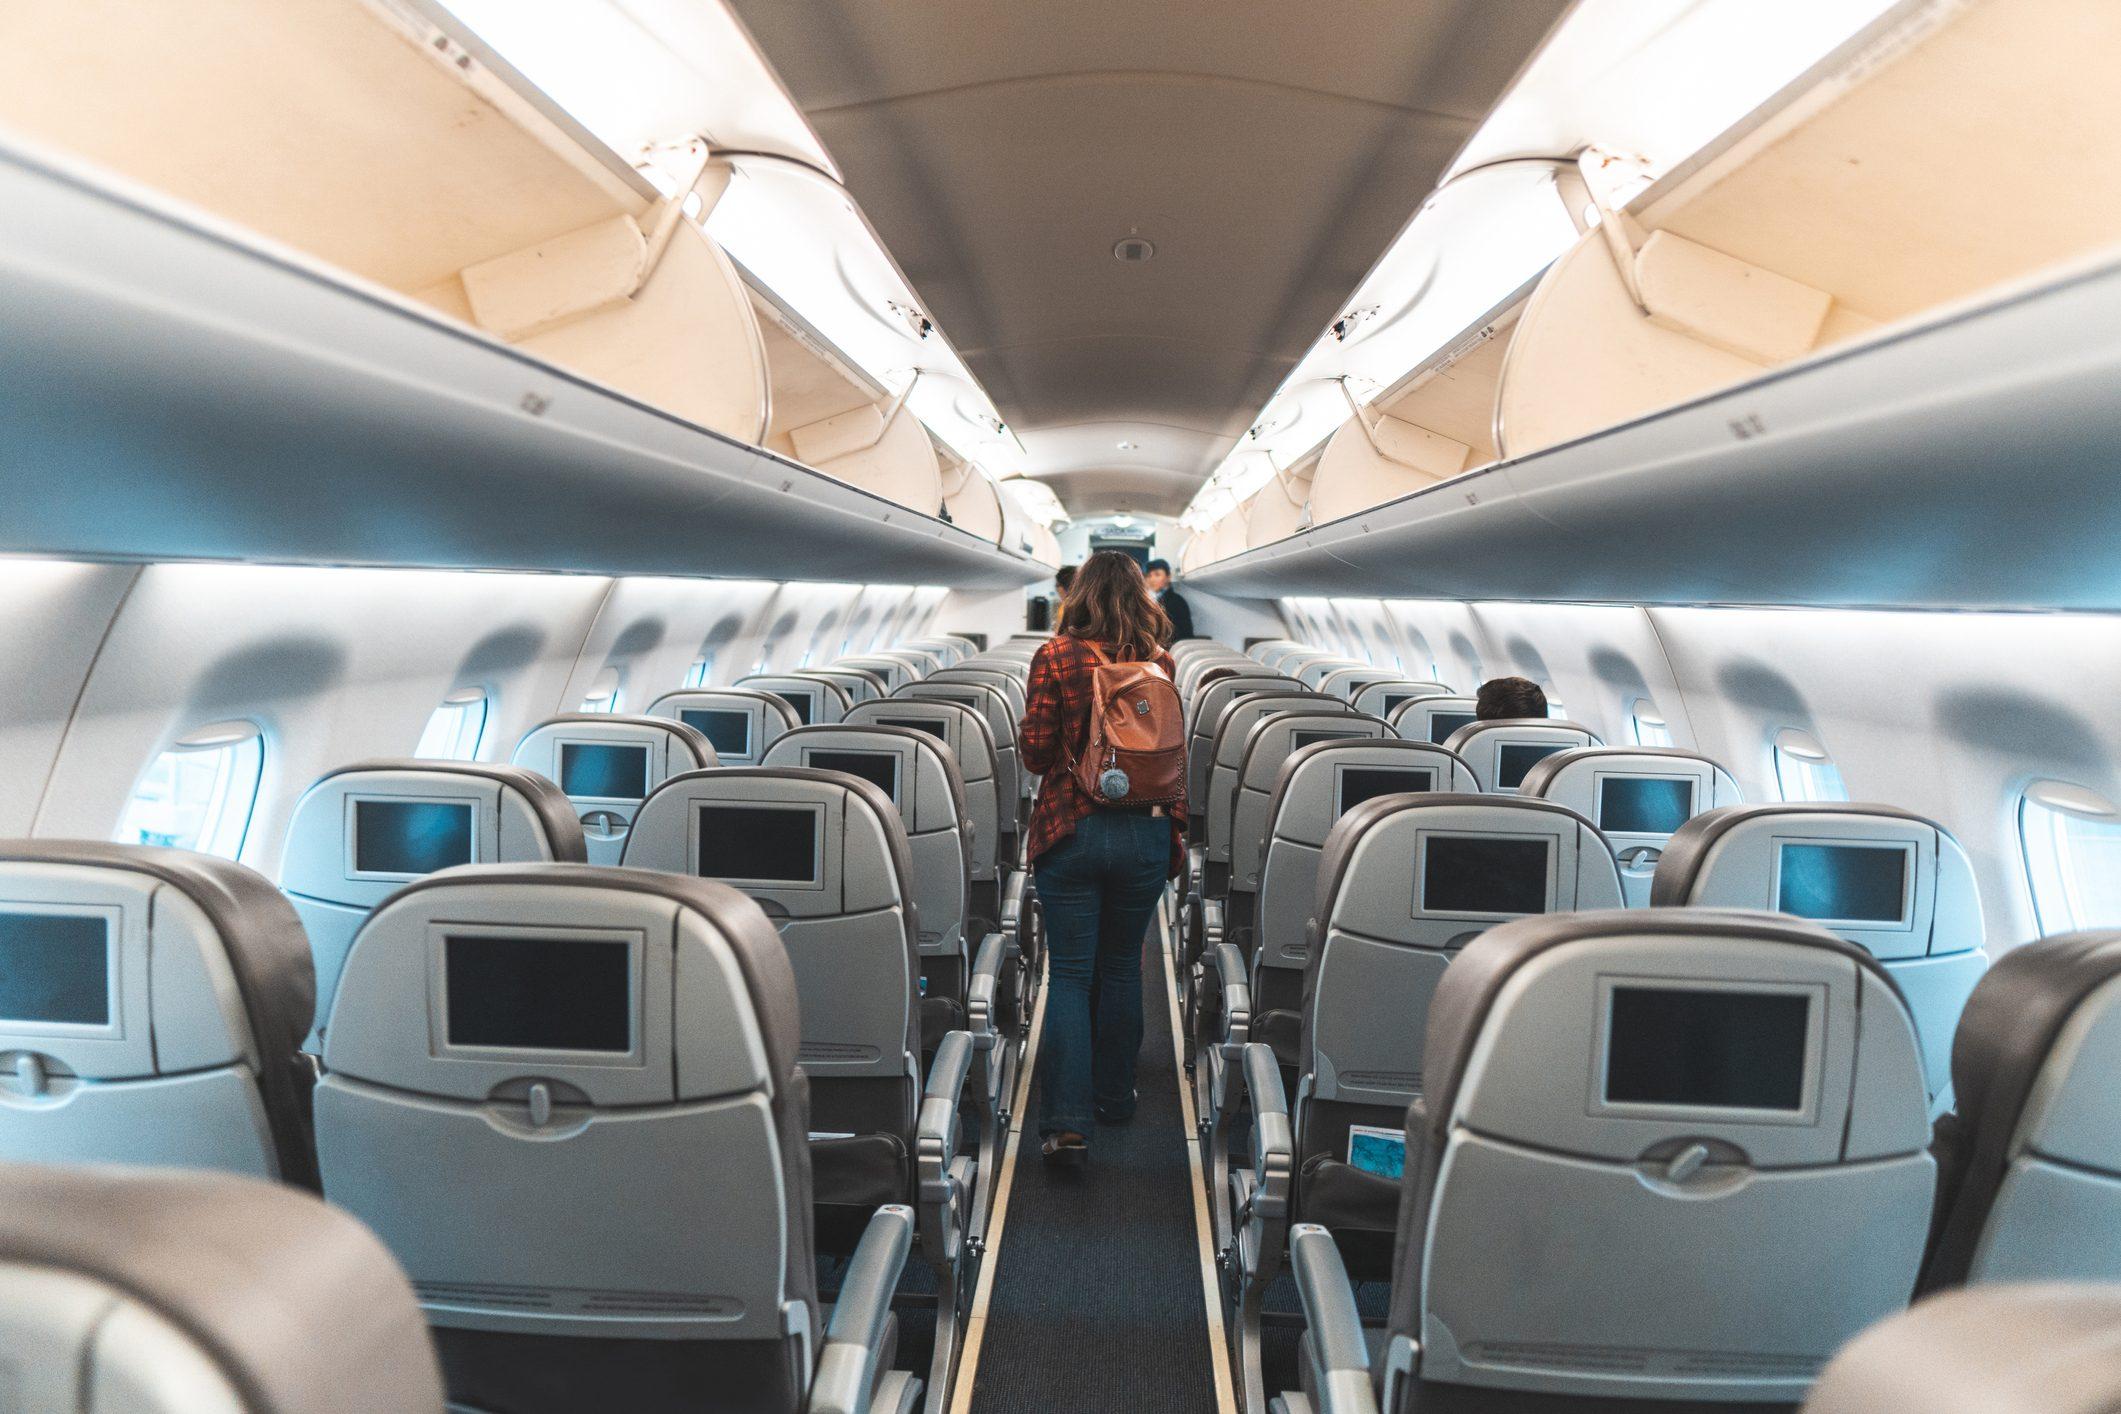 Woman walking the aisle on plane